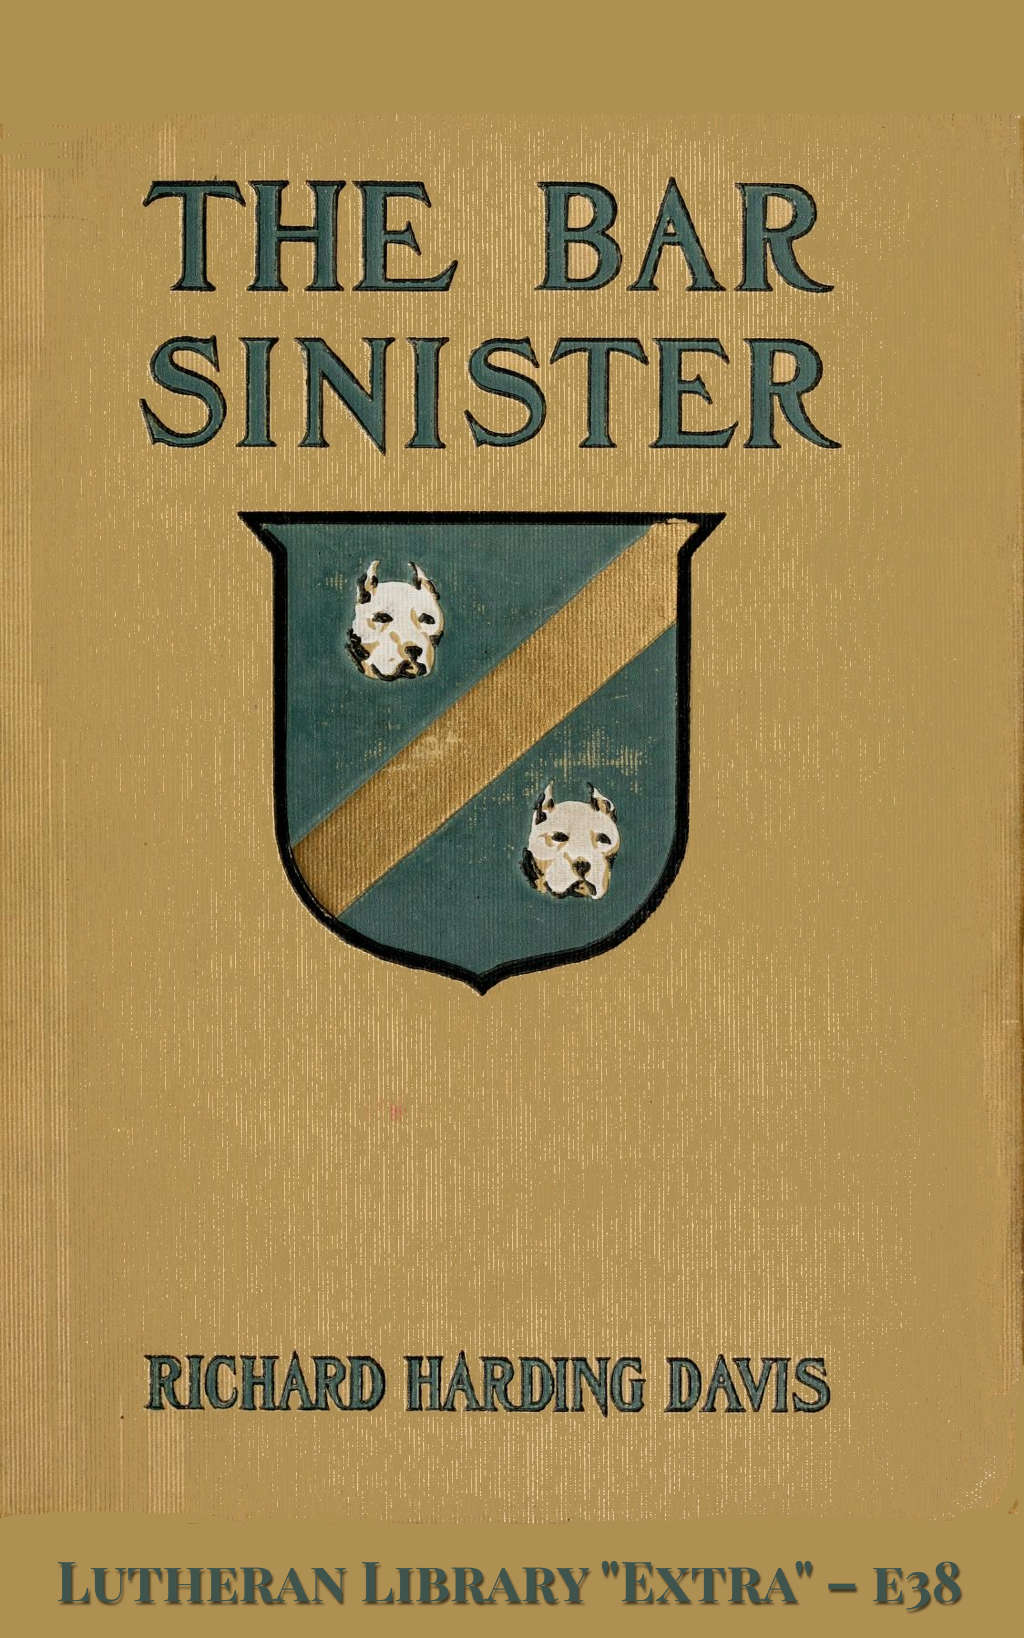 The Bar Sinister by Richard Harding Davis (1864-1916)